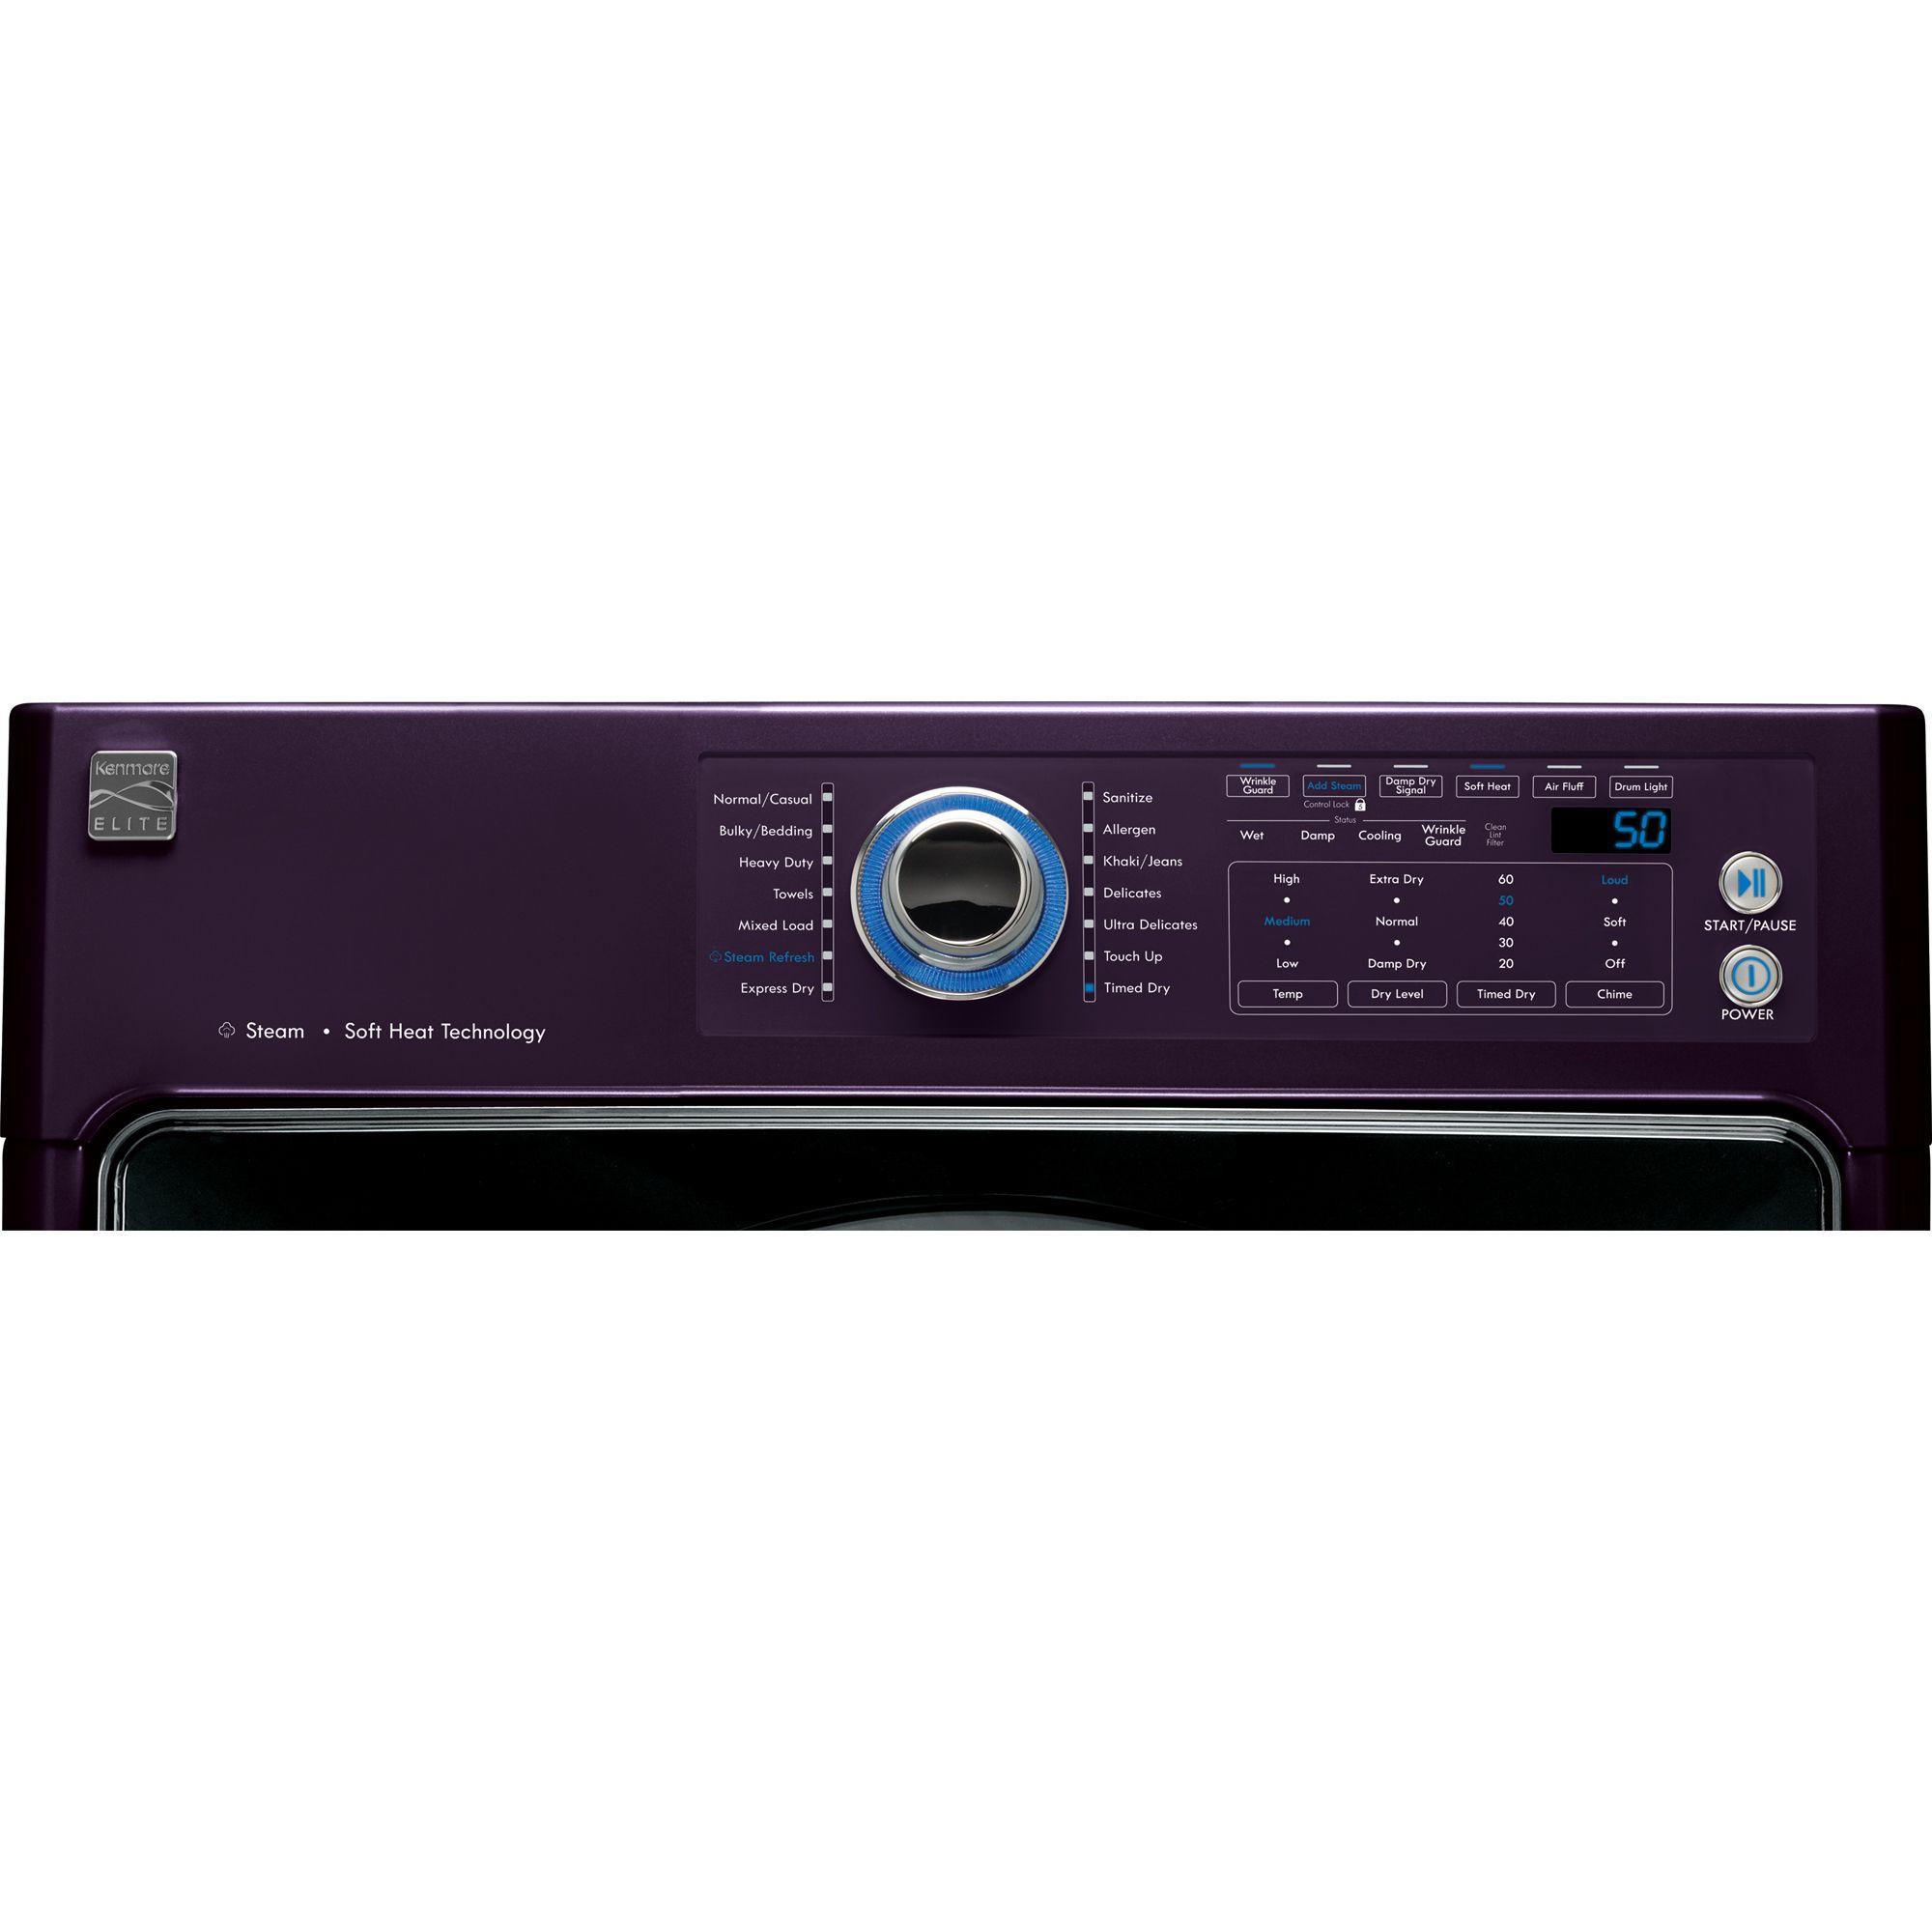 Kenmore Elite 8.0 cu. ft. Steam Electric Dryer